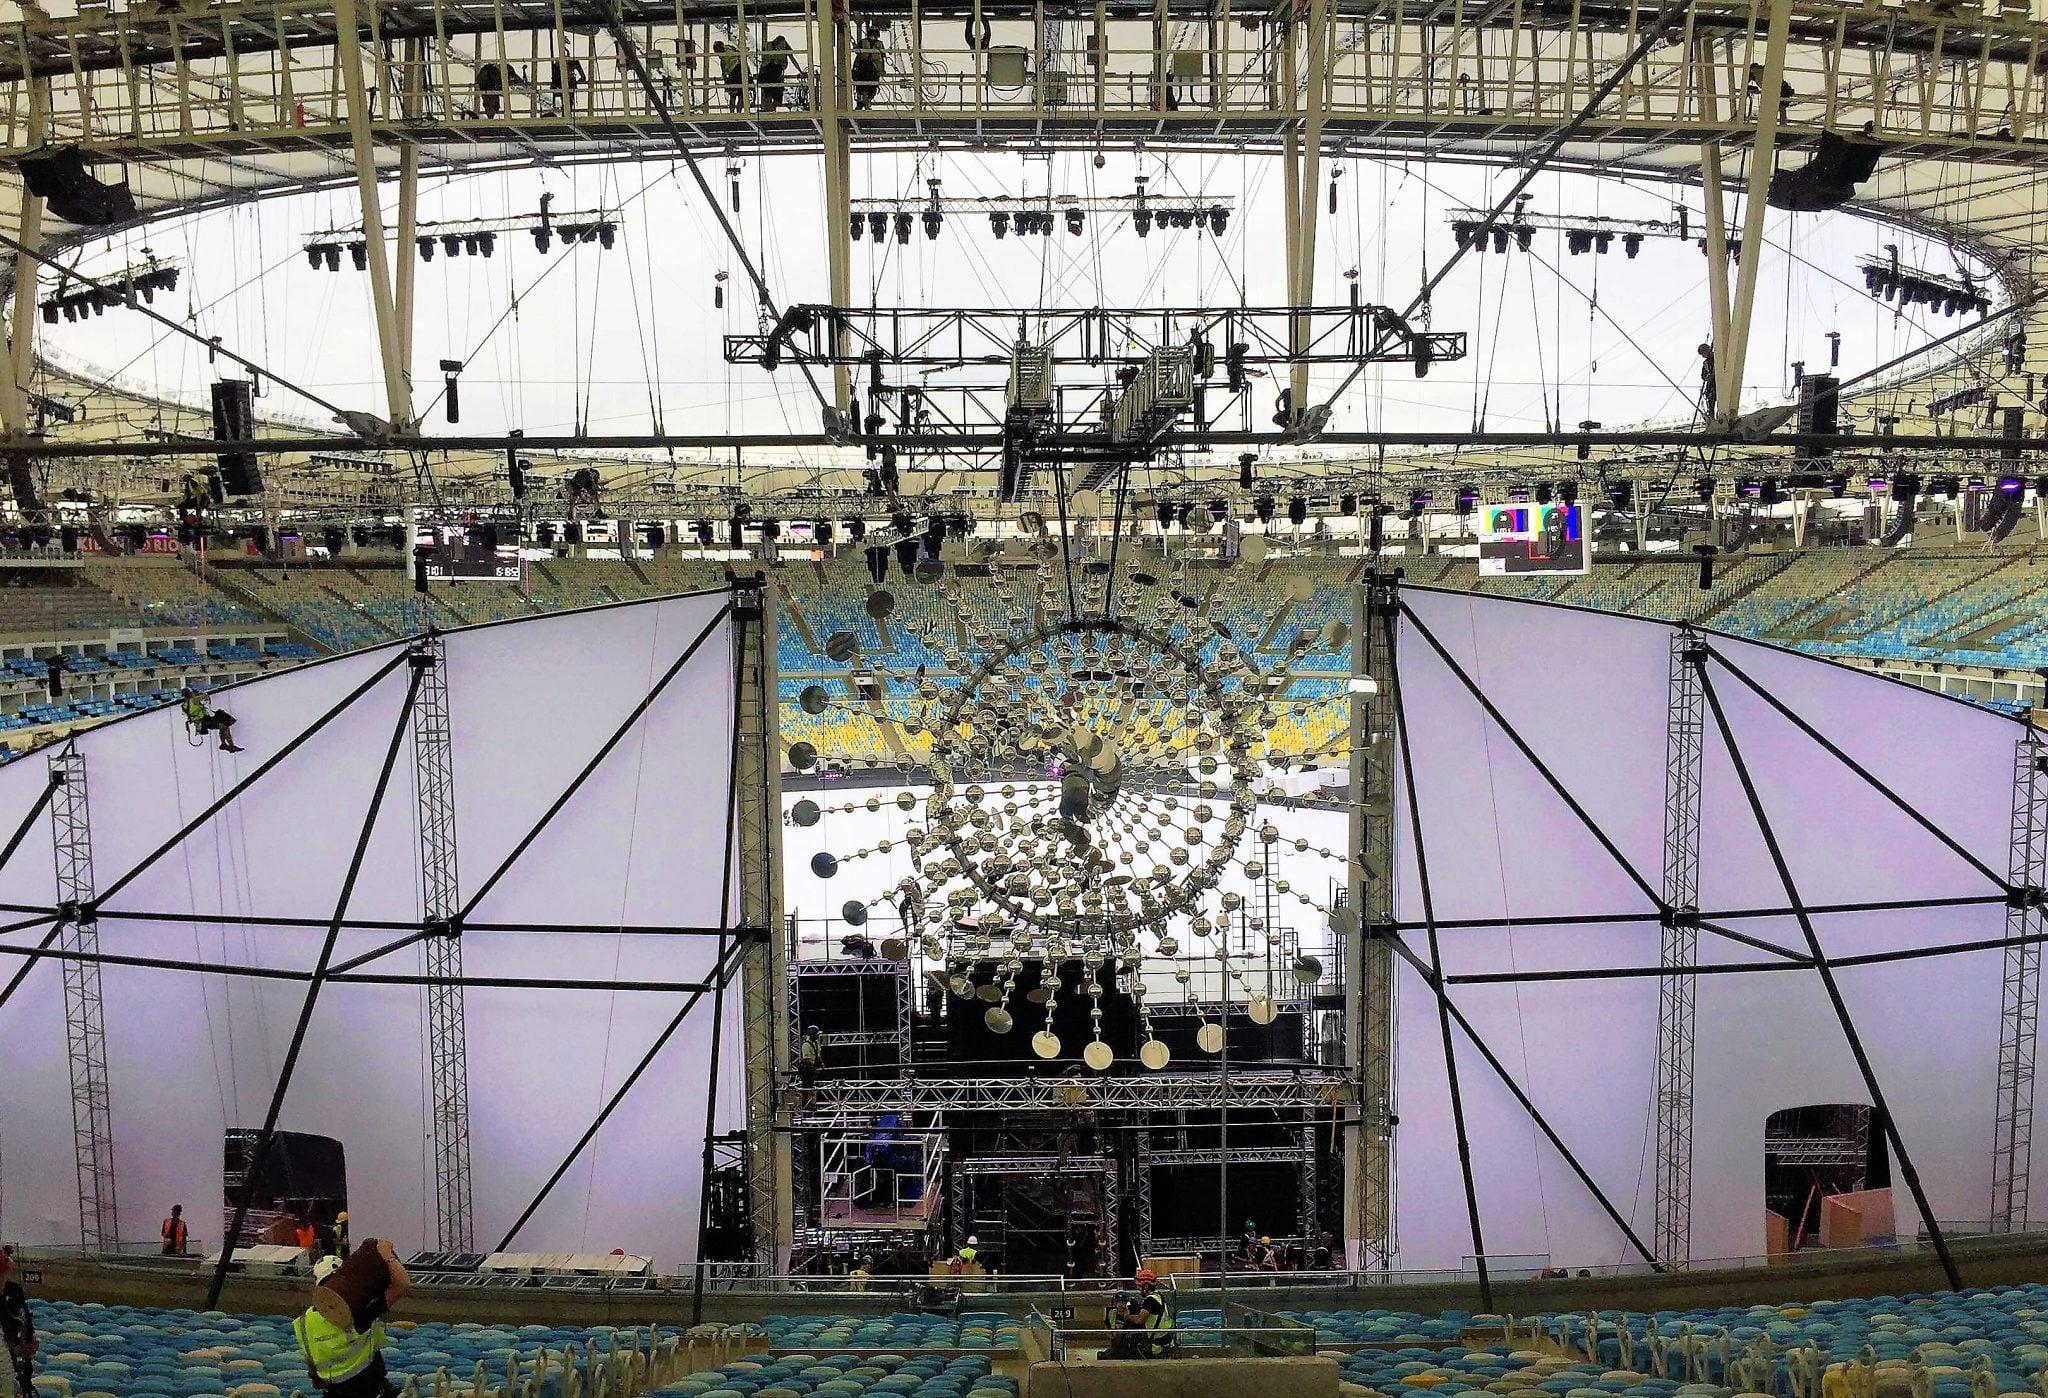 Rio olympics - Cyclorama with the Sun